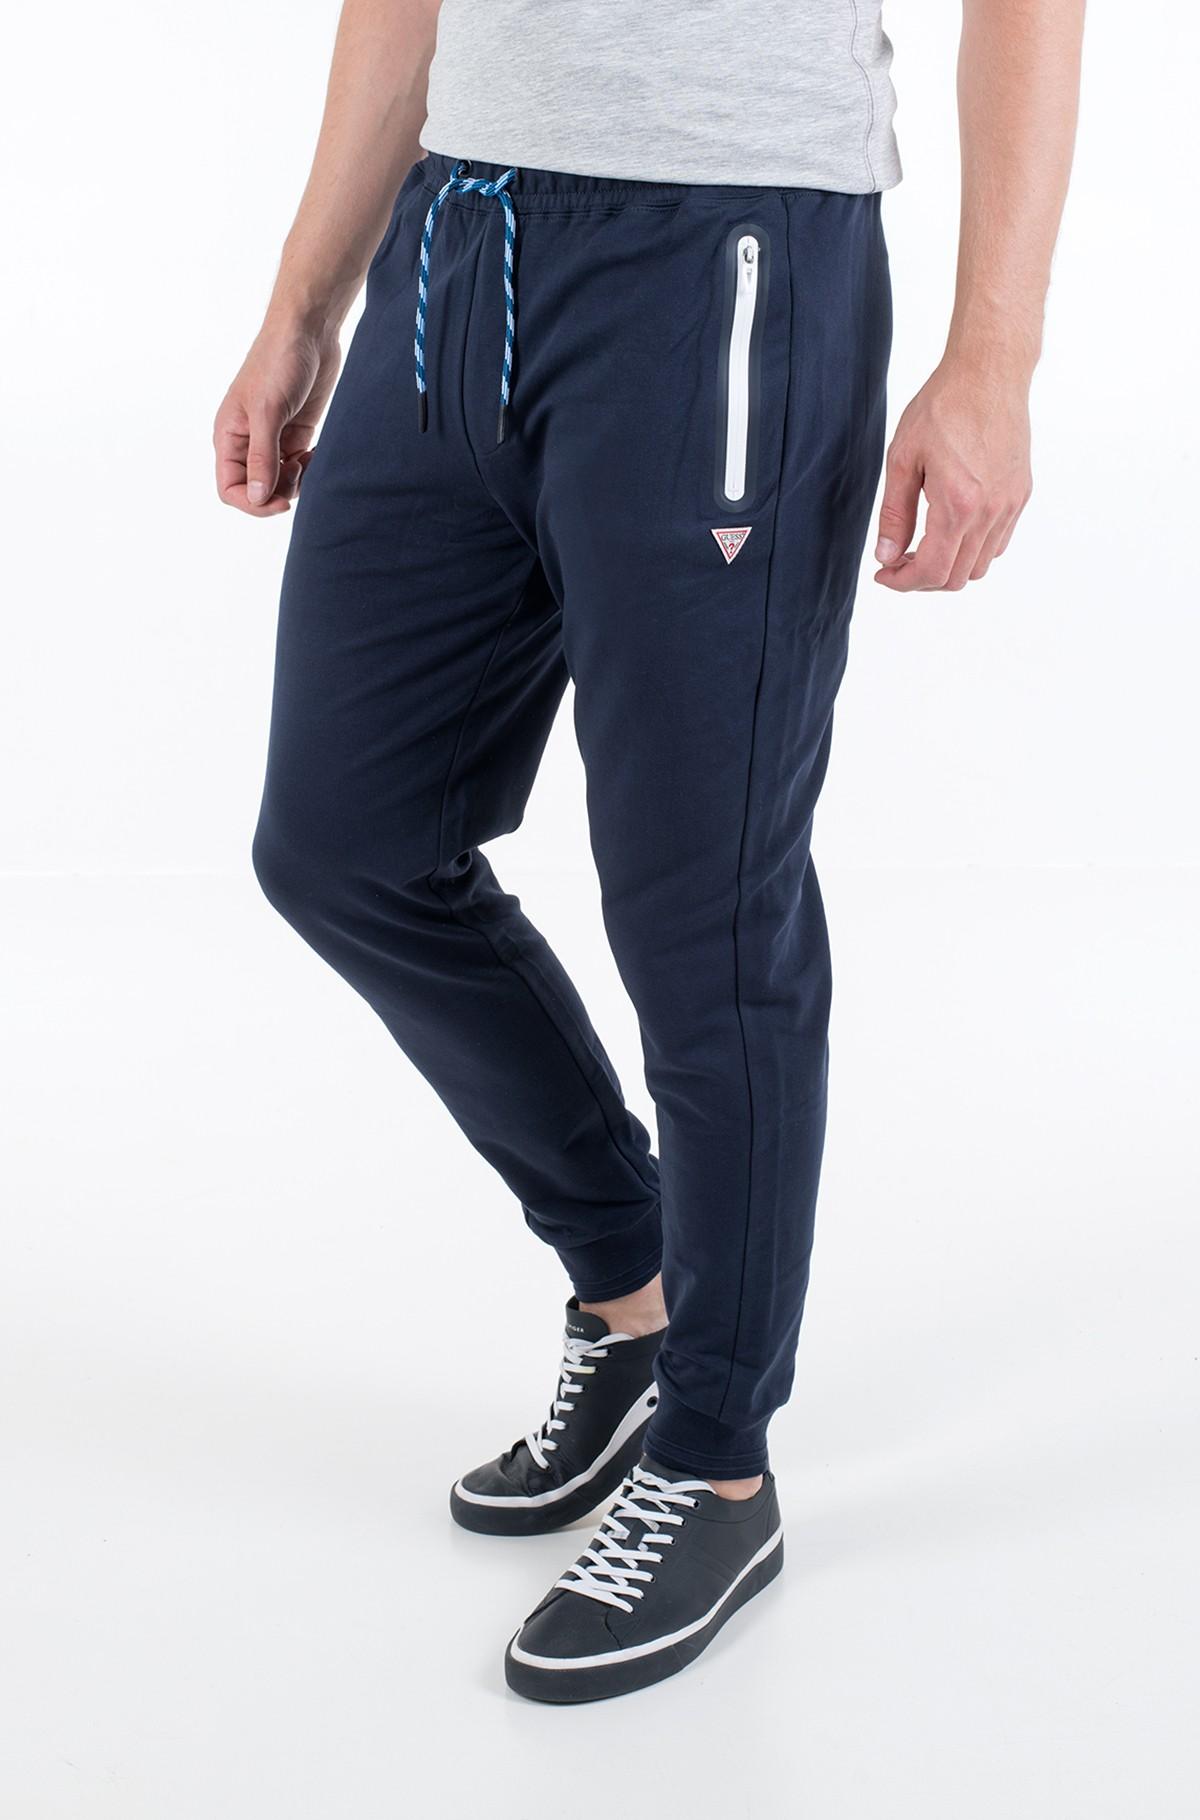 Sweatpants  M0YB37 K7ON0-full-1